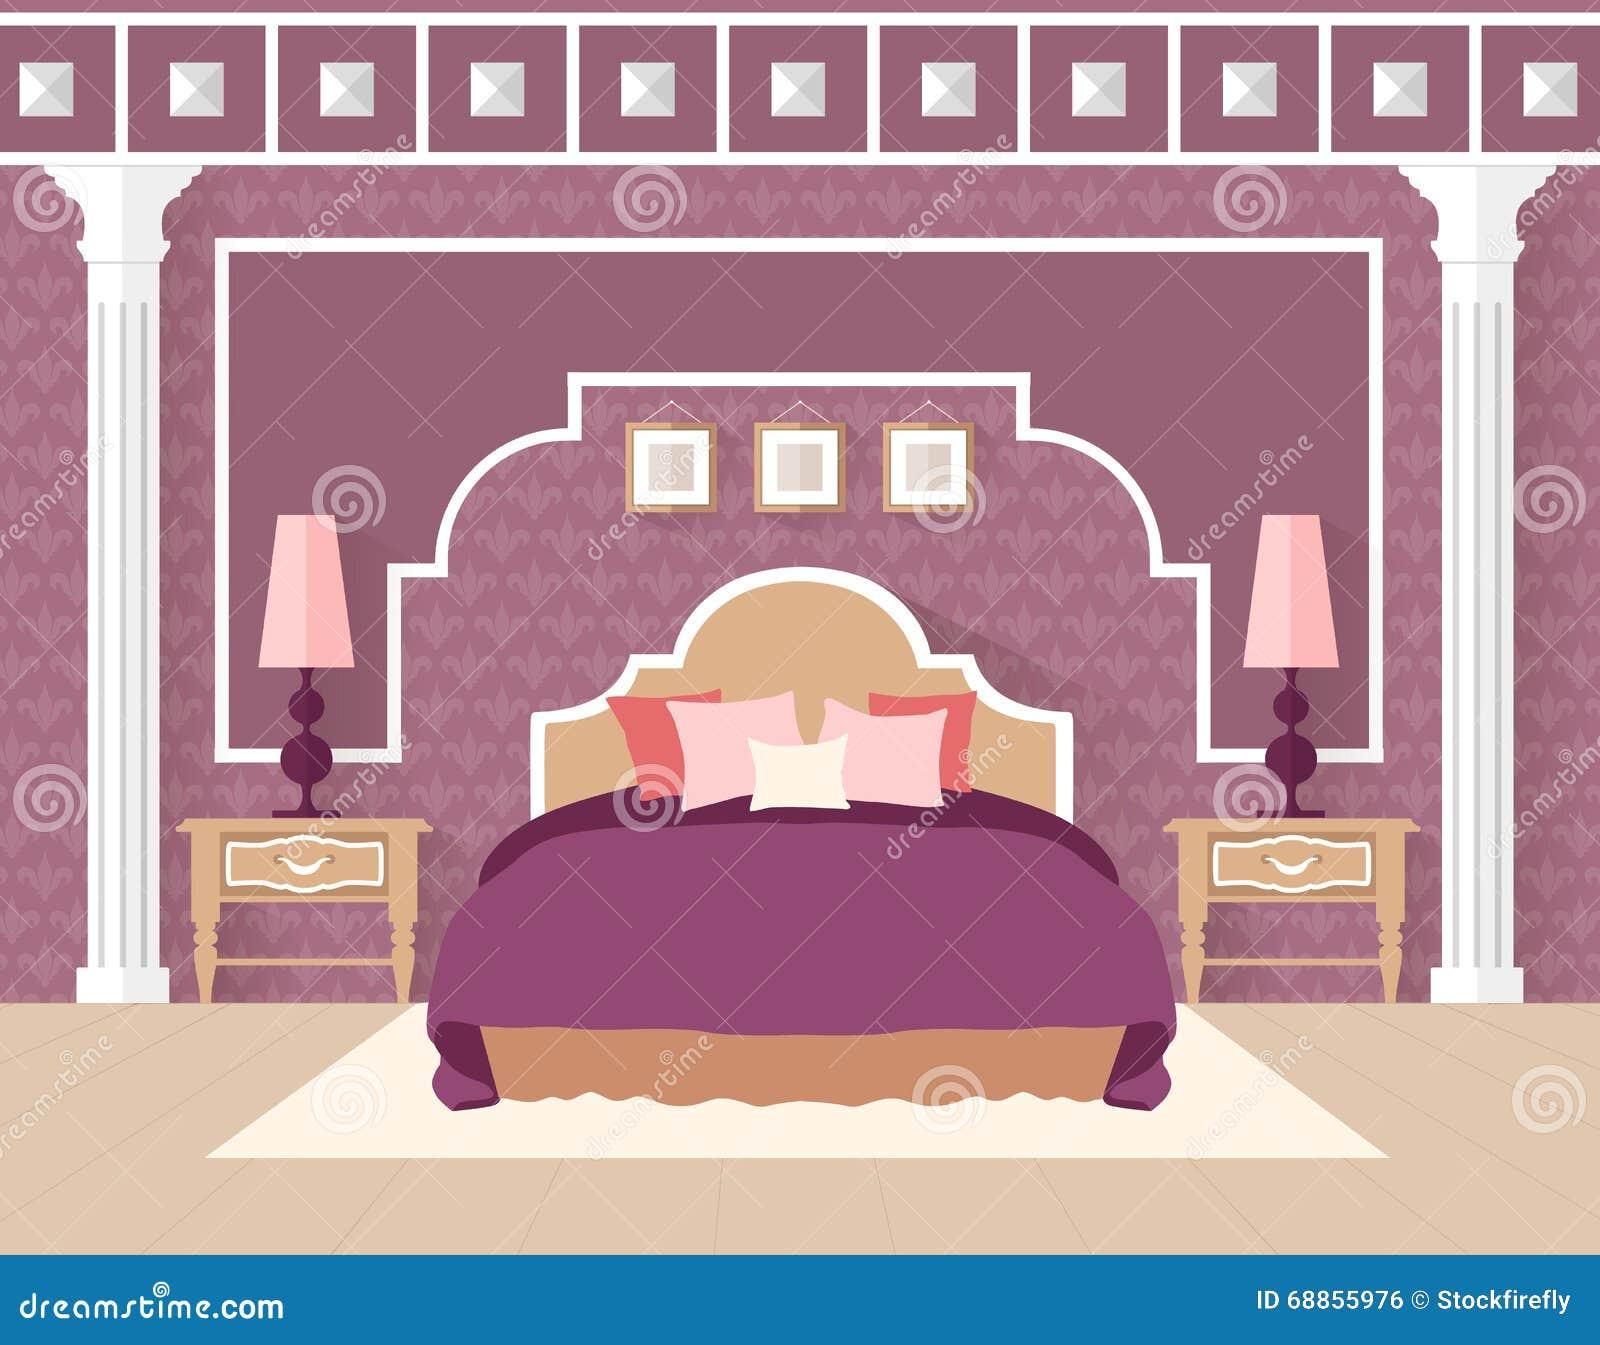 Bedroom Interior Design Set Furniture Vector ~ Flat bedroom design in retro colors vector background